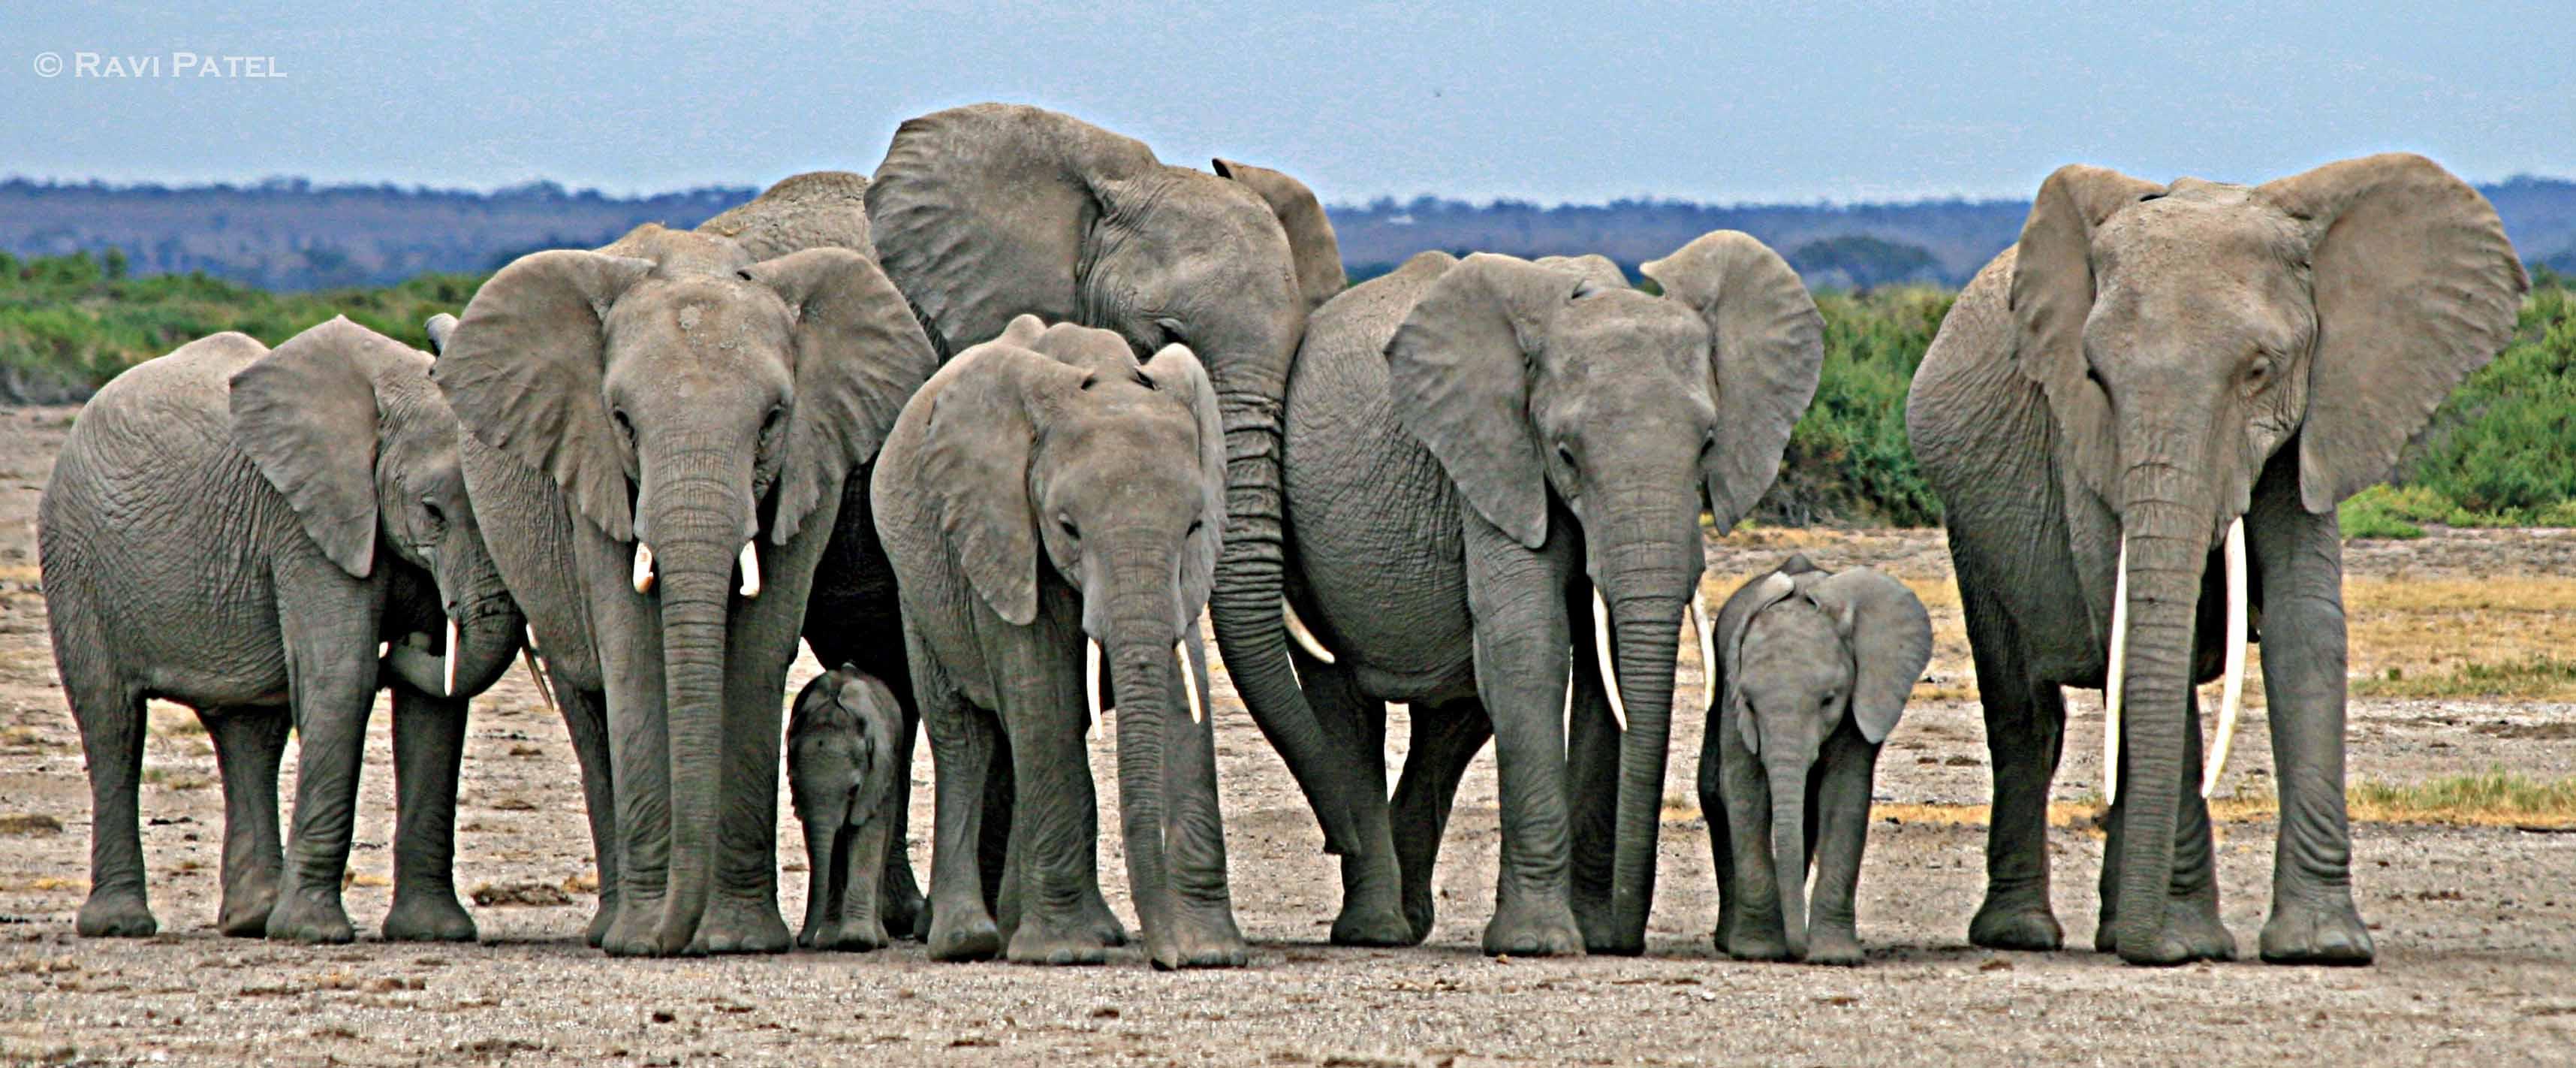 Elephant Family  Elephant